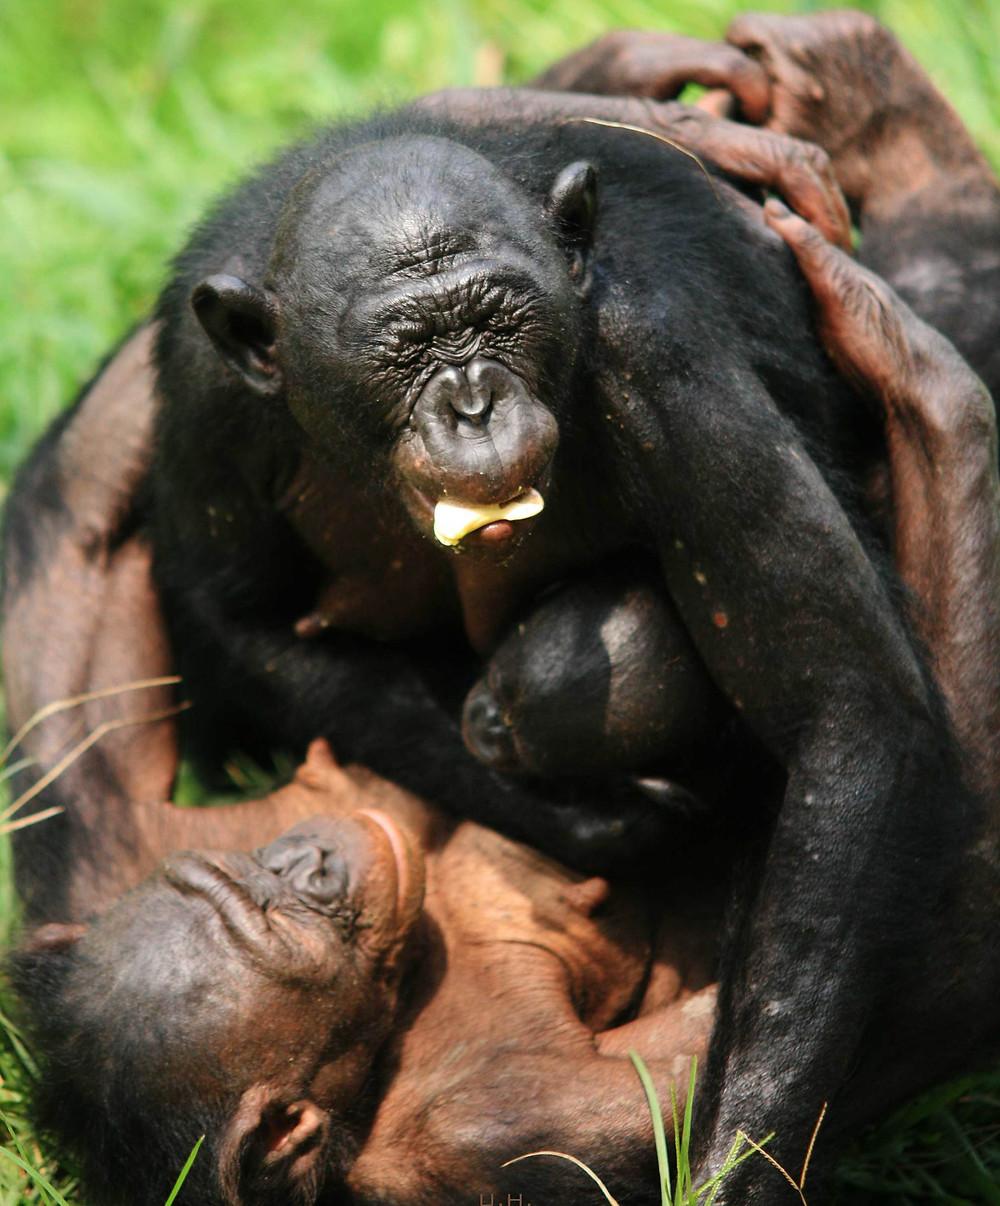 Una hembra bonobo abraza a un bonobo que acababa de llegar al grupo LOLA YA BONOBO SANCTUARY